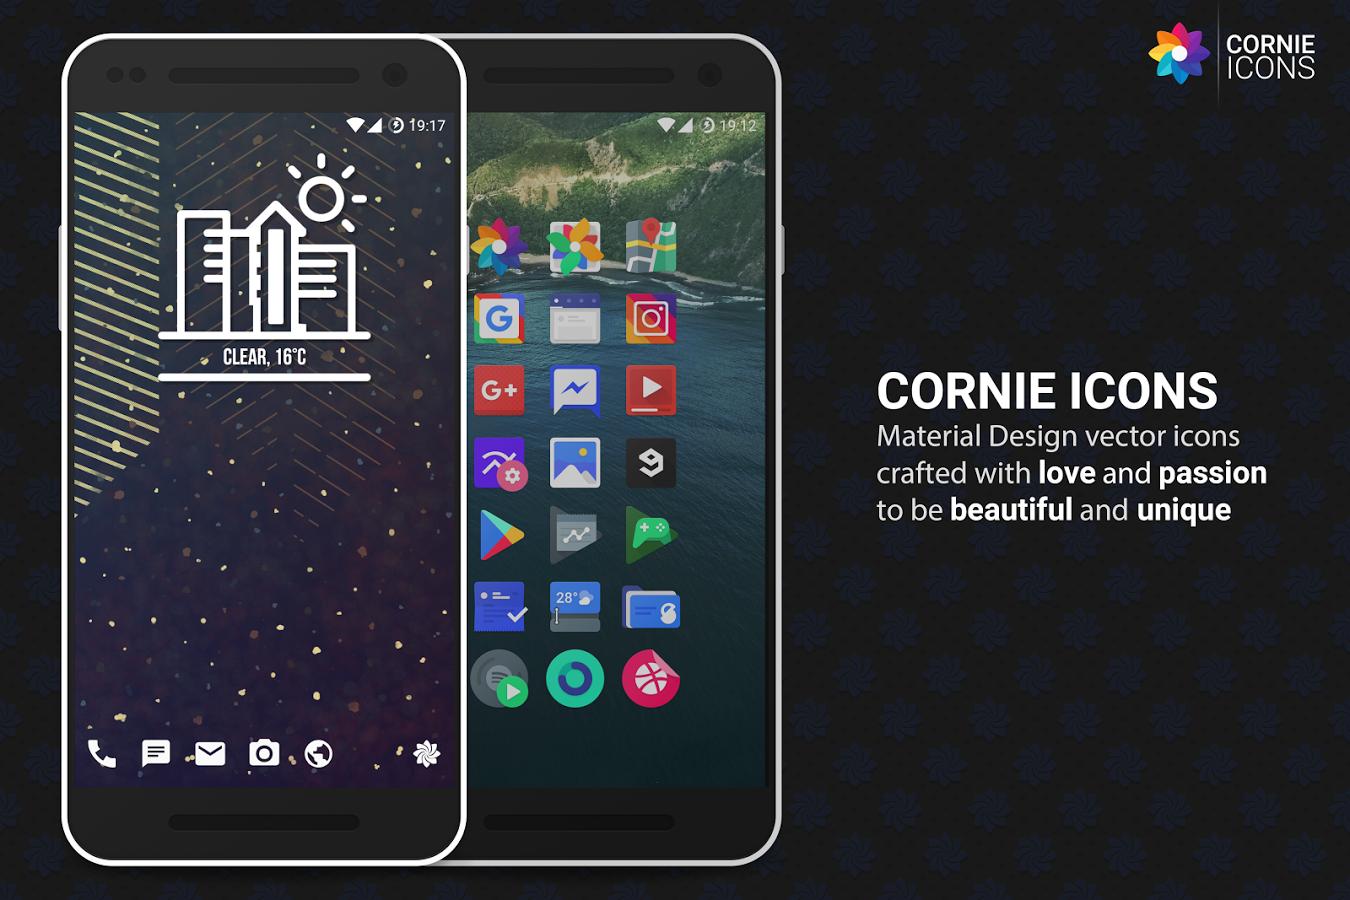 Cornie icons